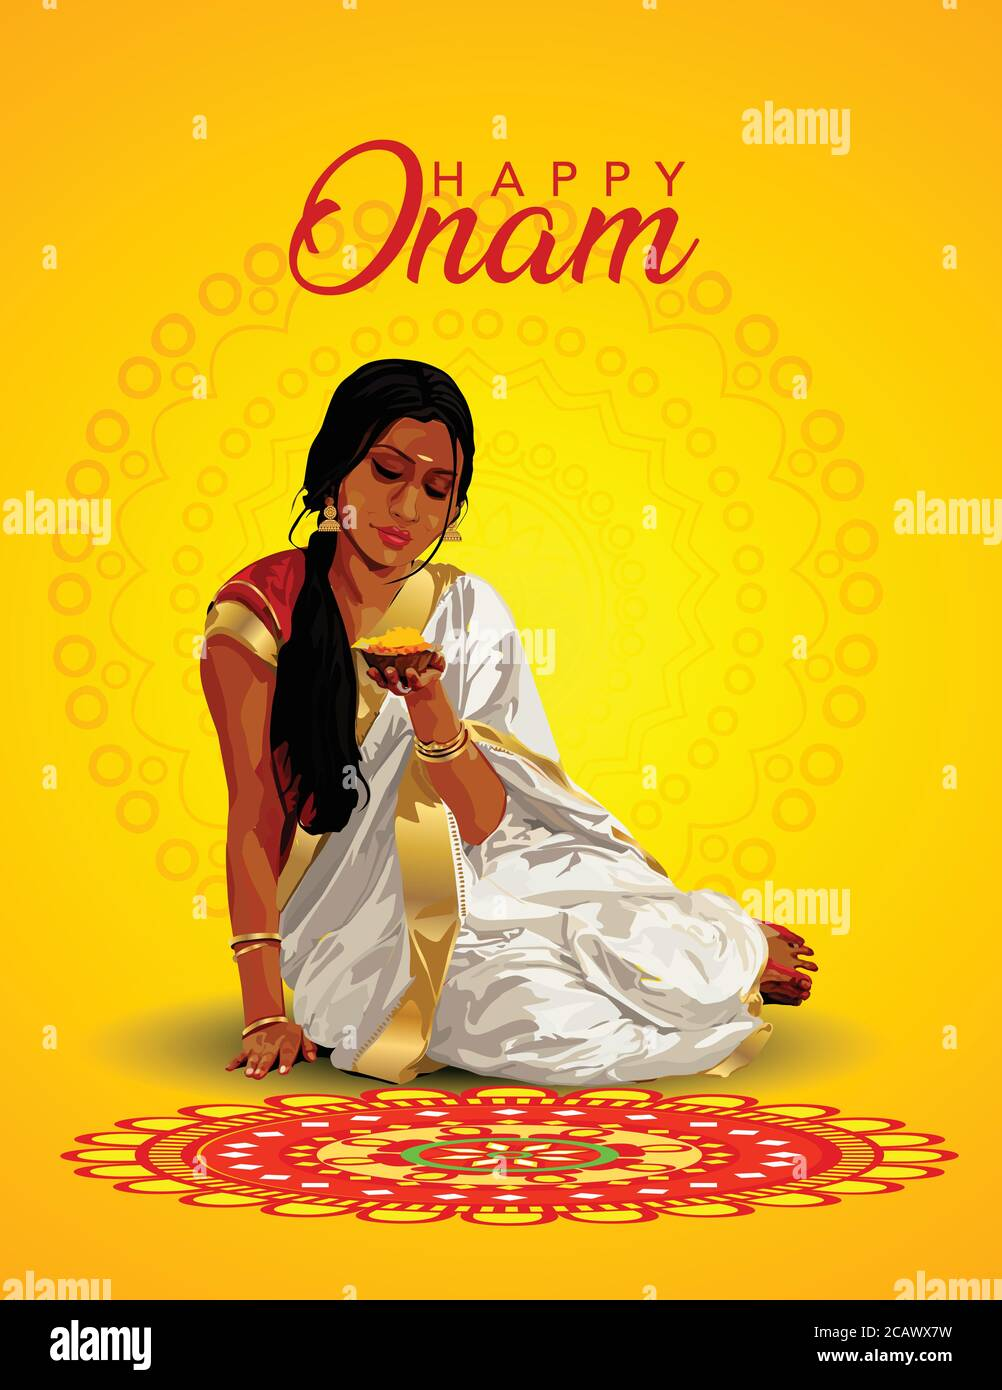 Happy Onam Greetings Vector Illustration Illustration Of Woman Making Pookalam For Onam Stock Vector Image Art Alamy